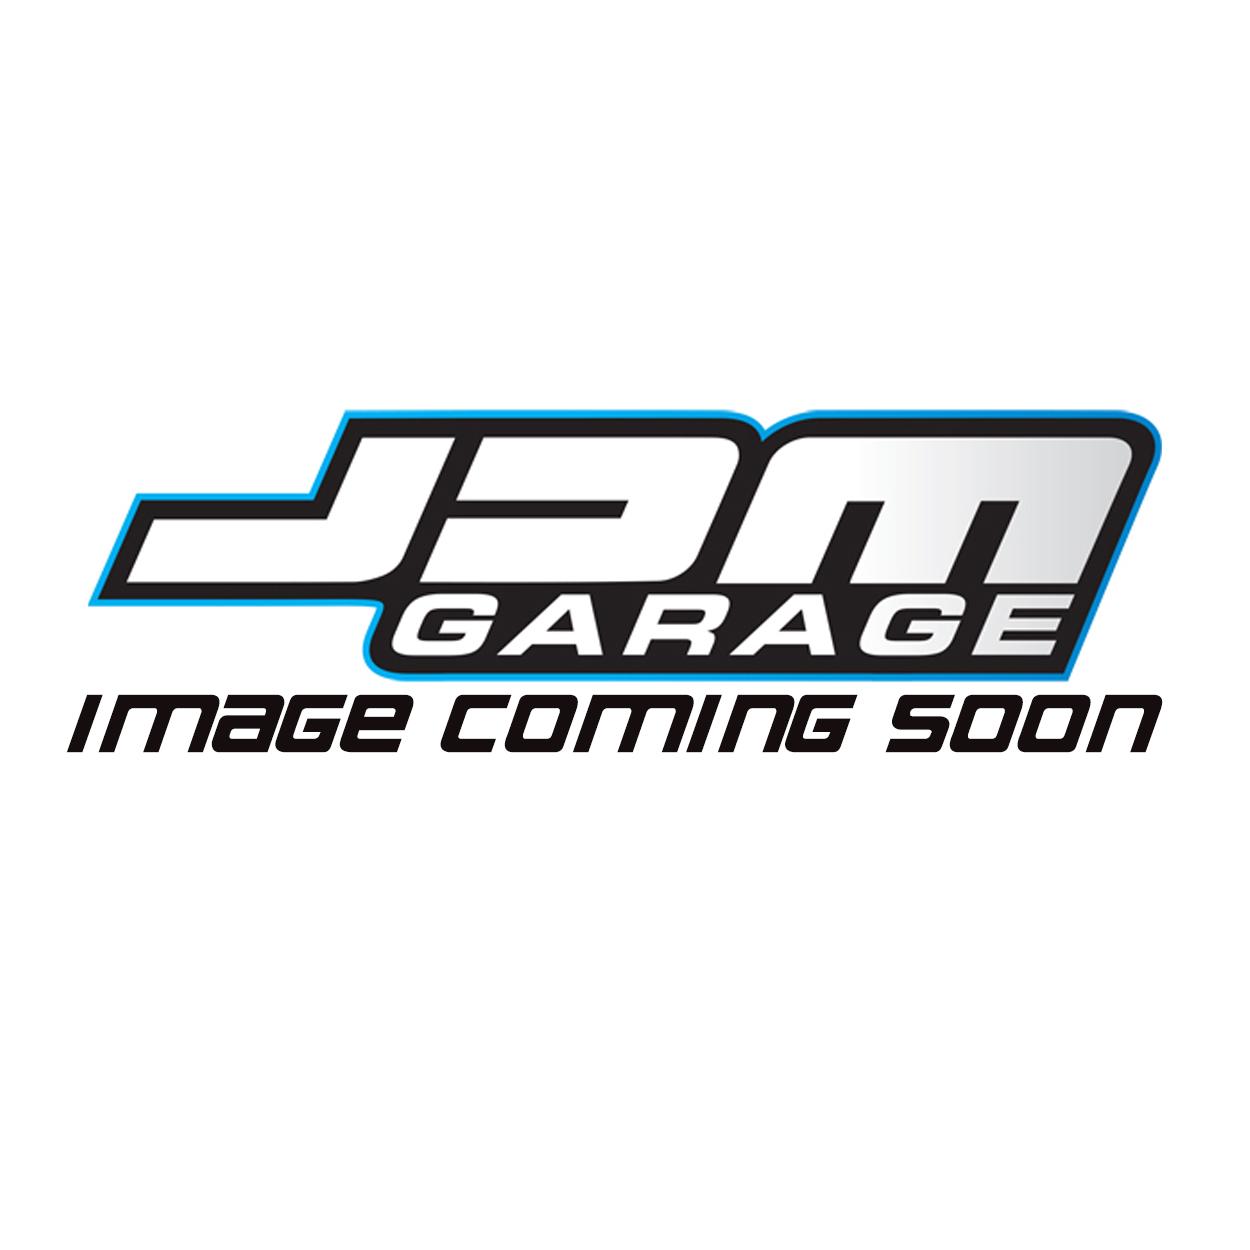 JDMGarageUK RB26 Ceramic Mug